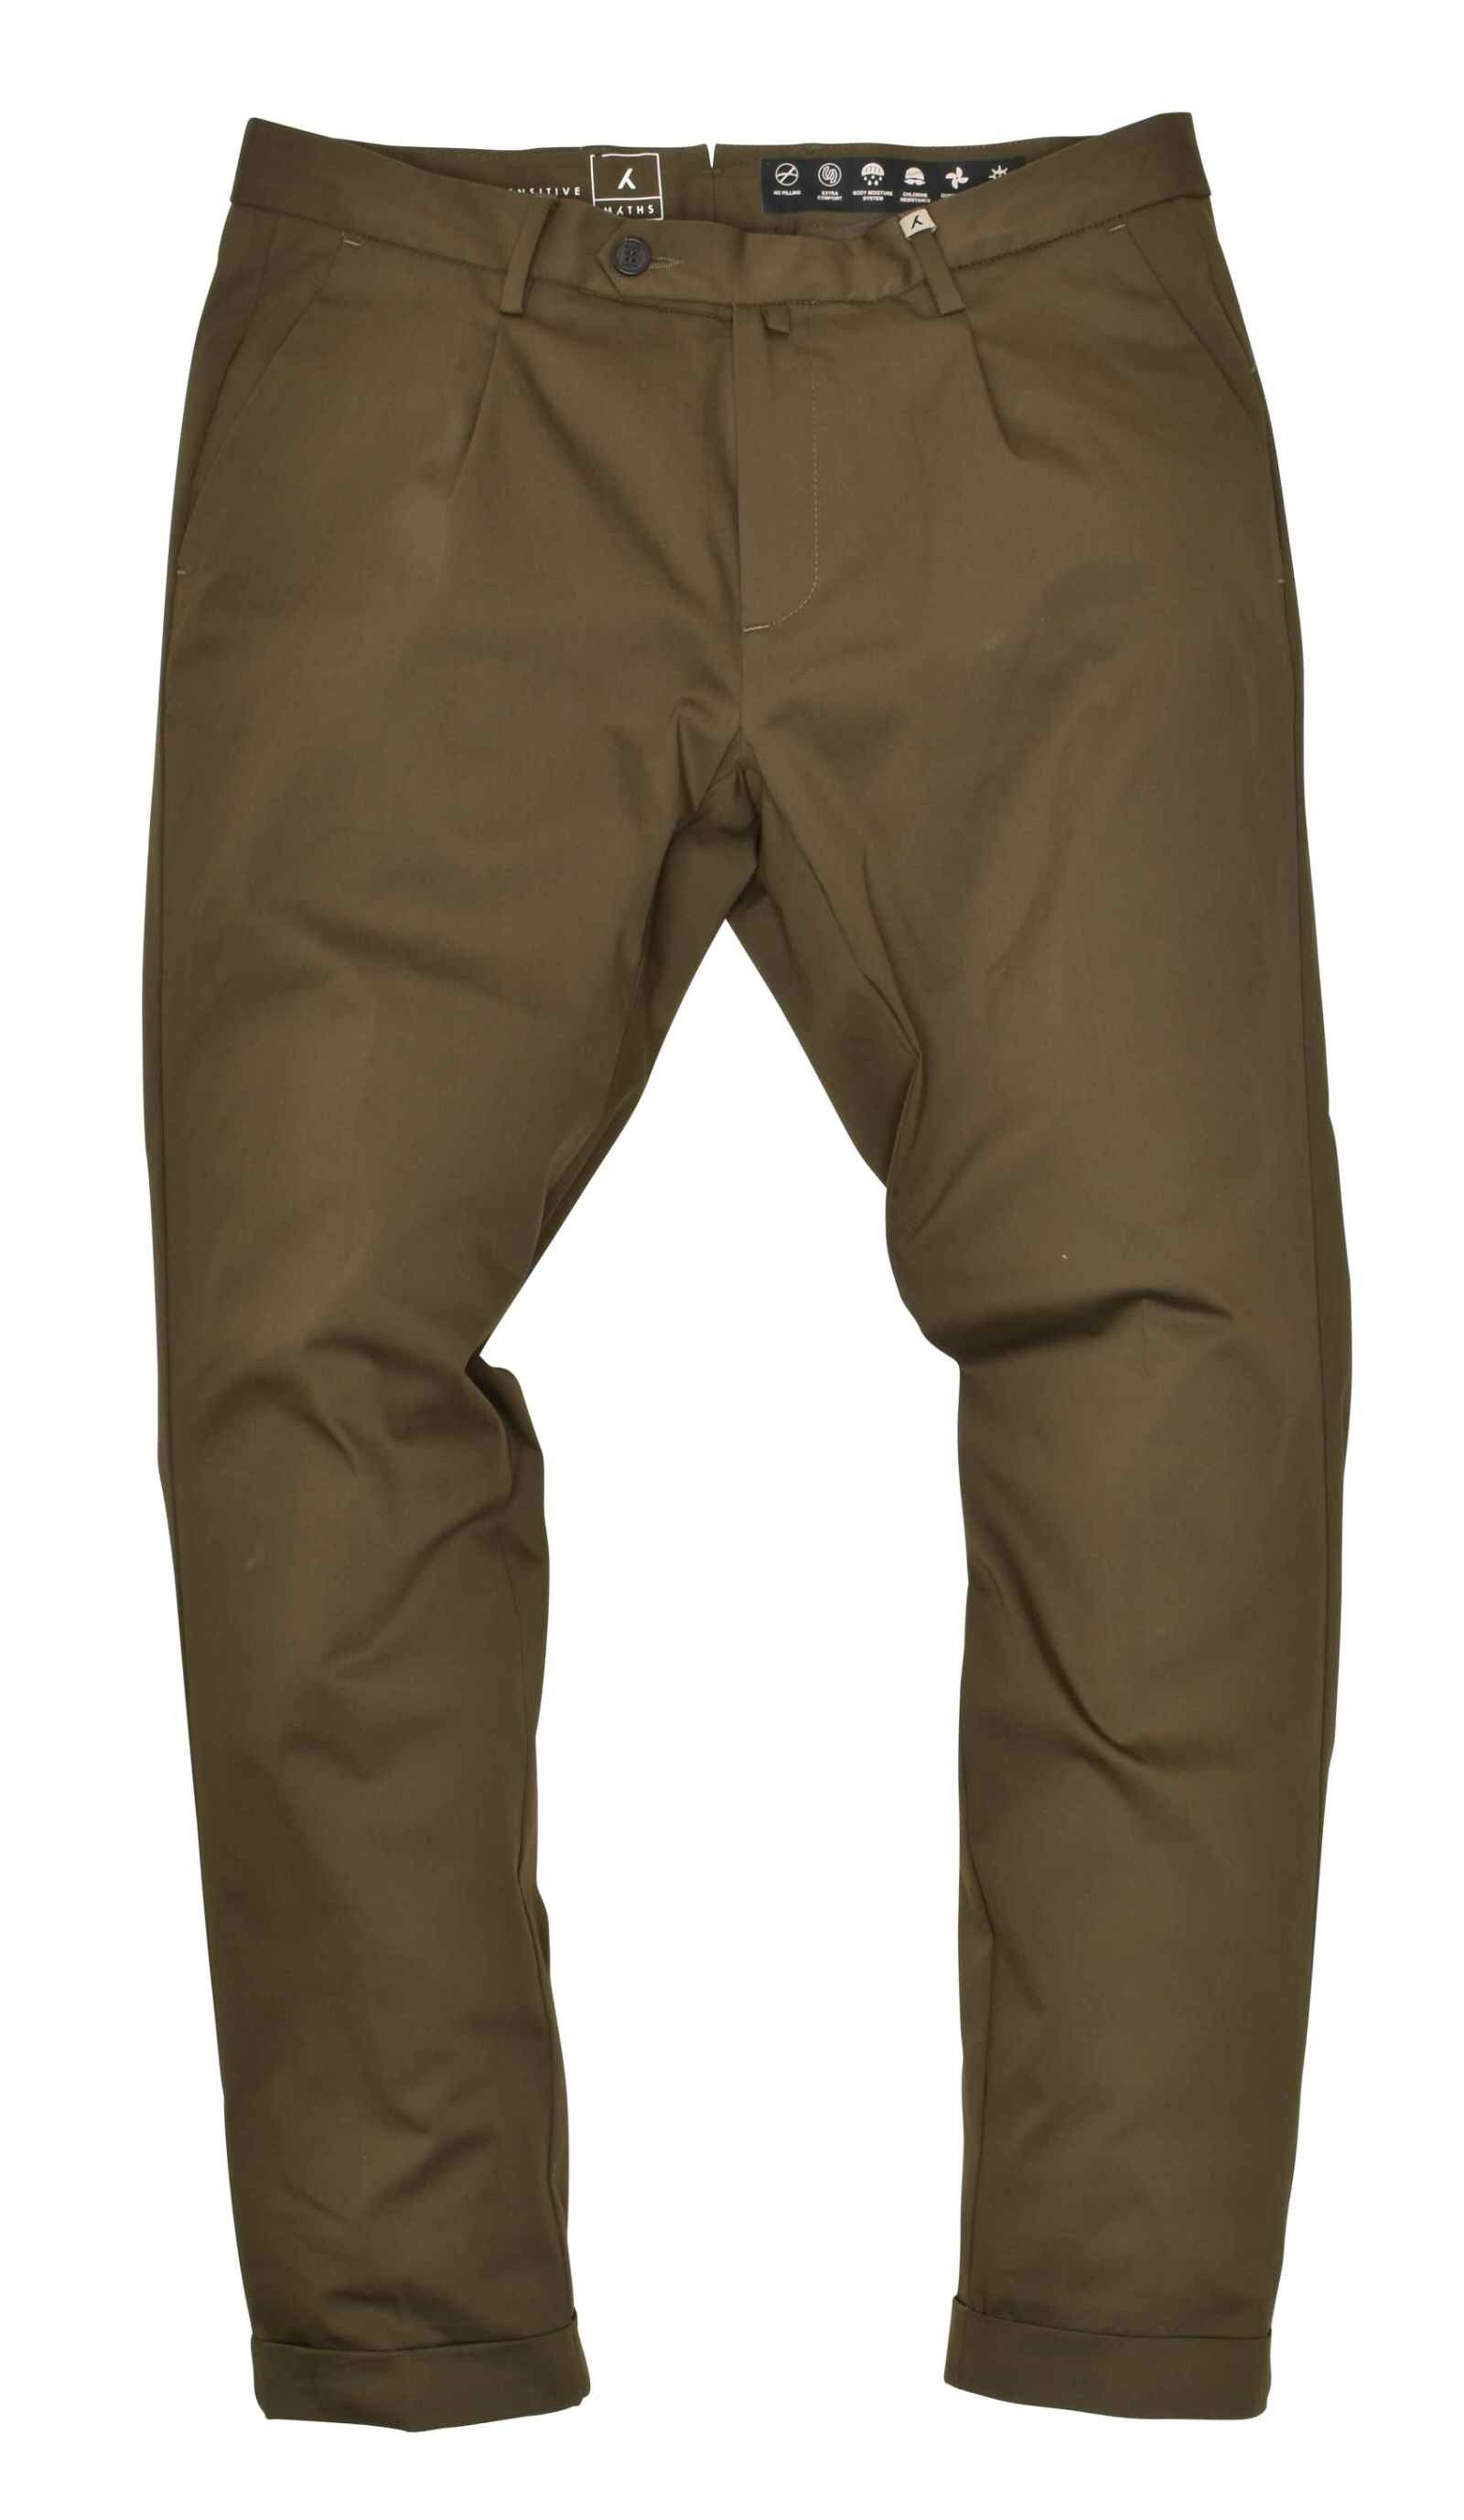 MYTHS - Herren Hose - Long Trousers - Khaki